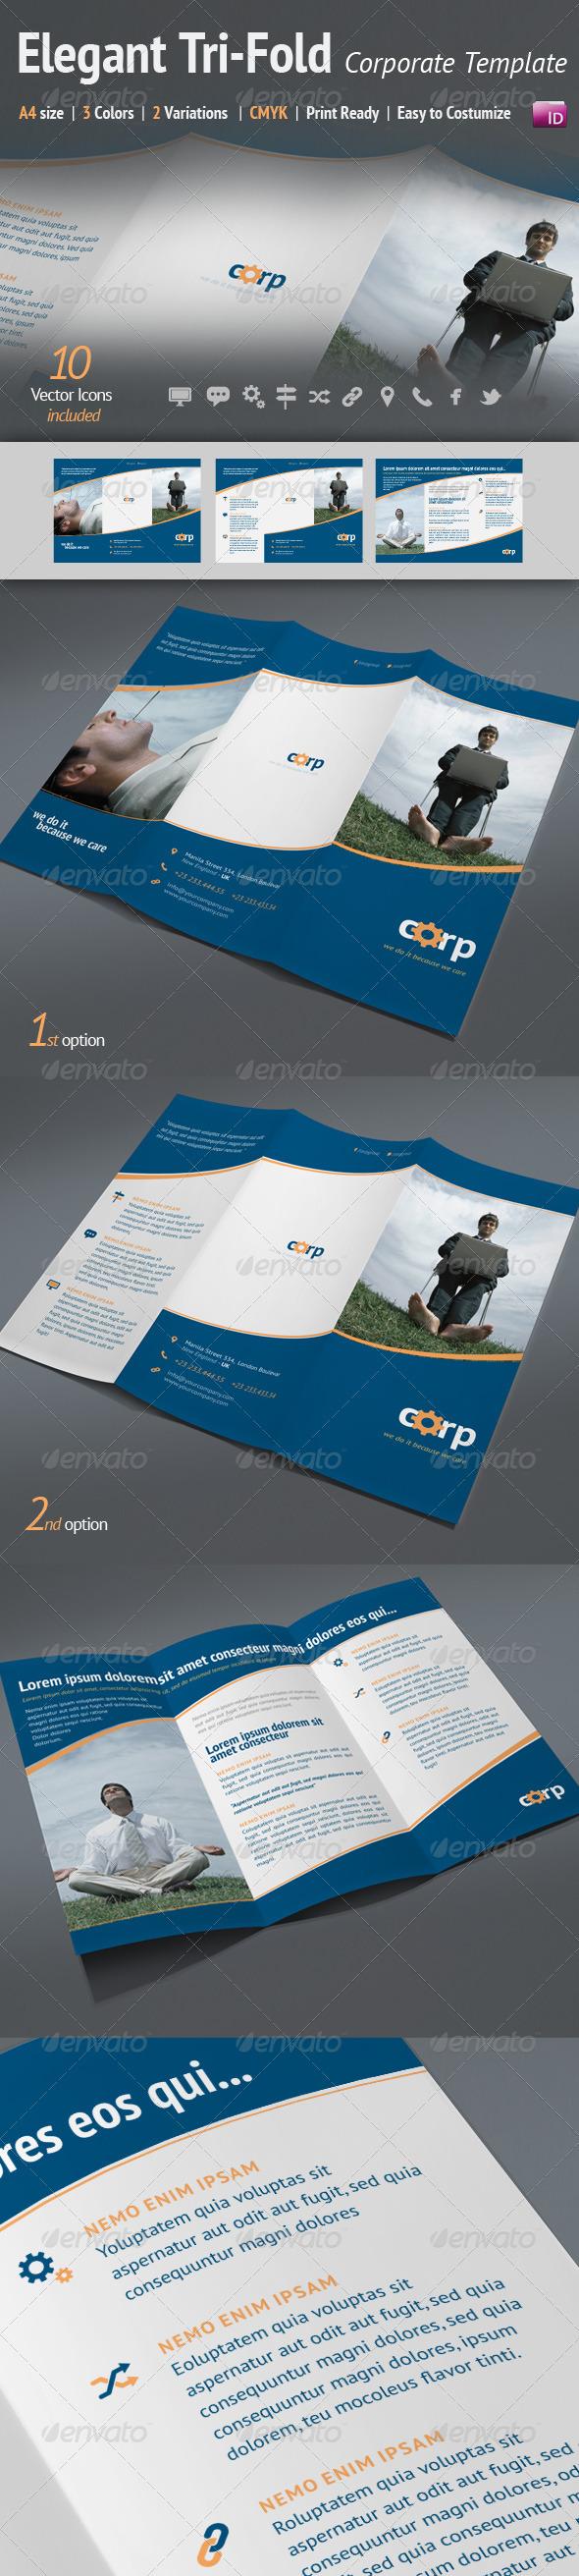 A4 Tri-Fold Elegant Corporate Template | 3 Colors - Corporate Brochures